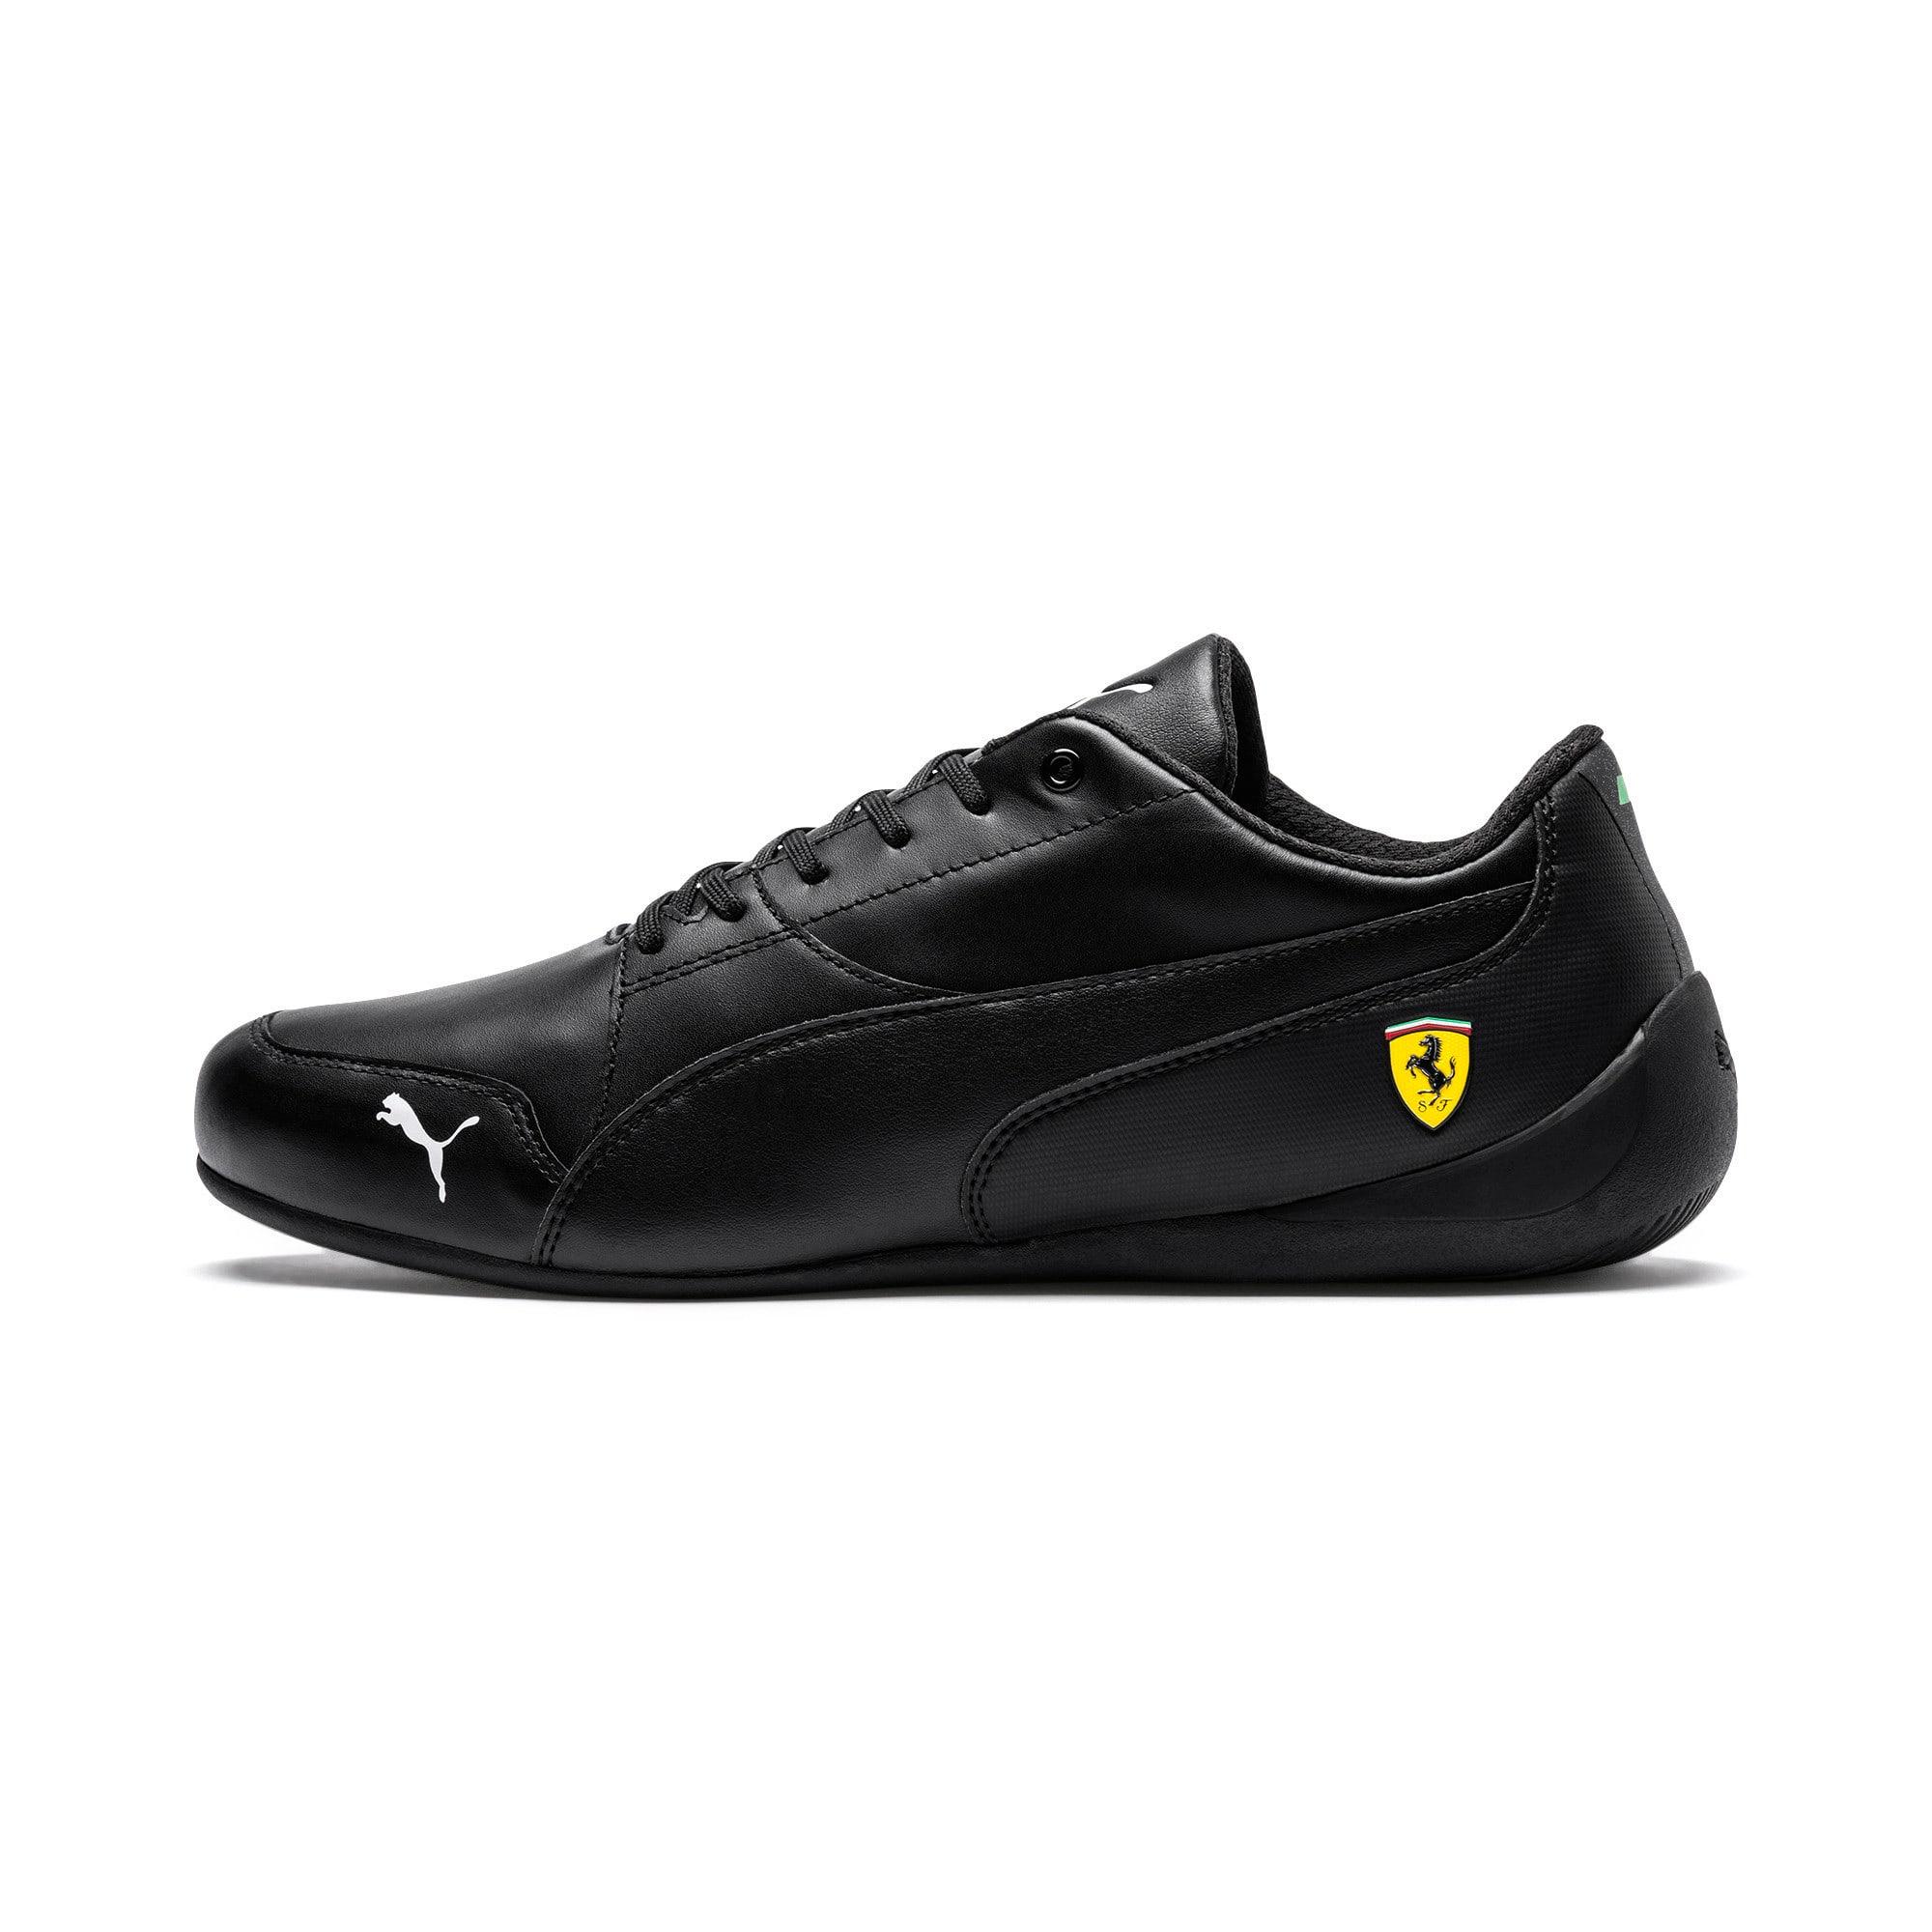 Thumbnail 1 of Ferrari Drift Cat 7 Trainers, Puma Black-Puma Black, medium-IND